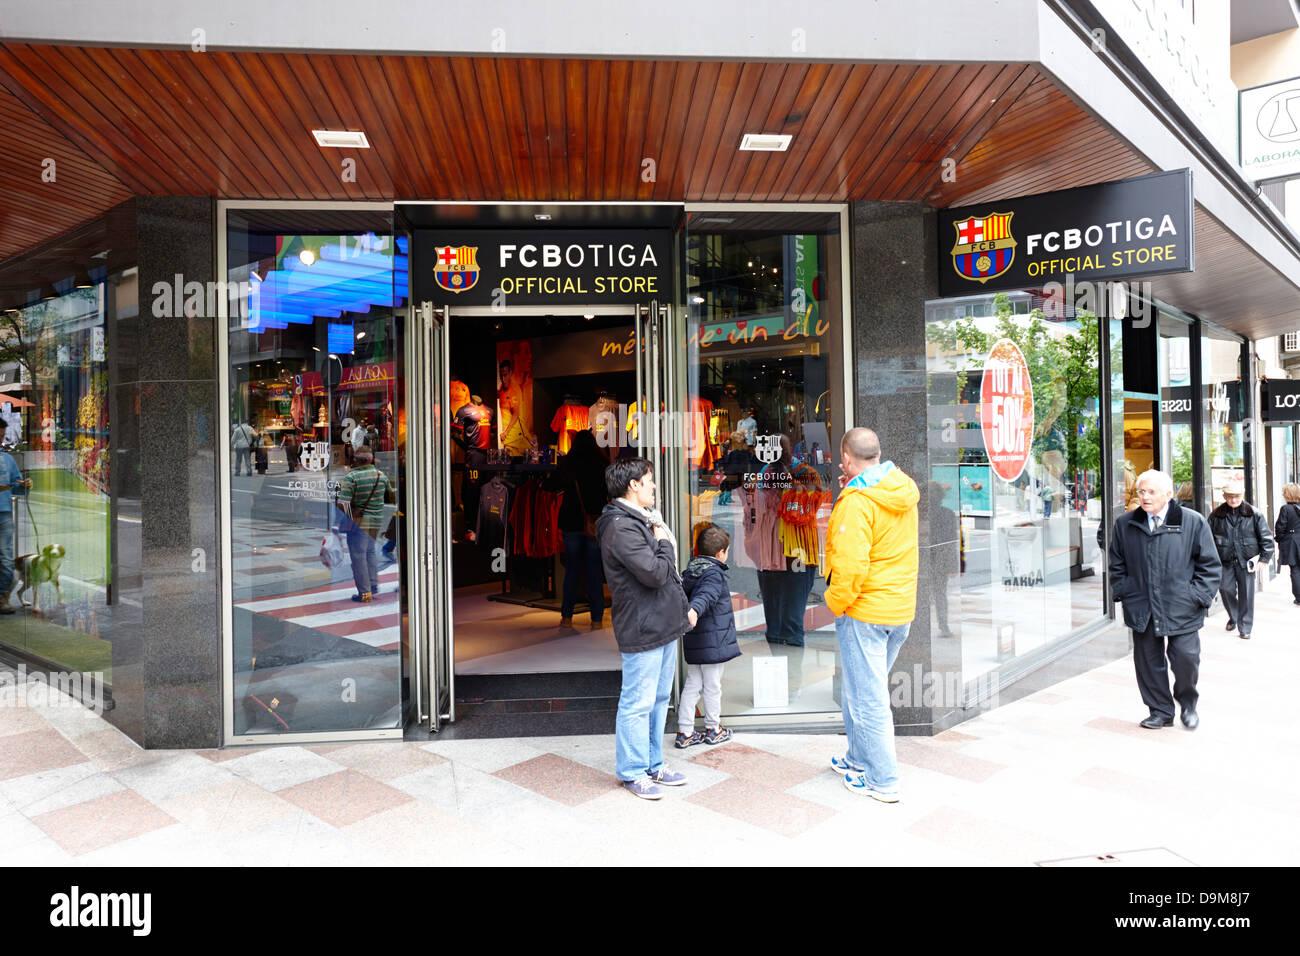 fcbotiga barcelona fc official store tax free shopping in andorra la vella  andorra 1ecfa6a4eee